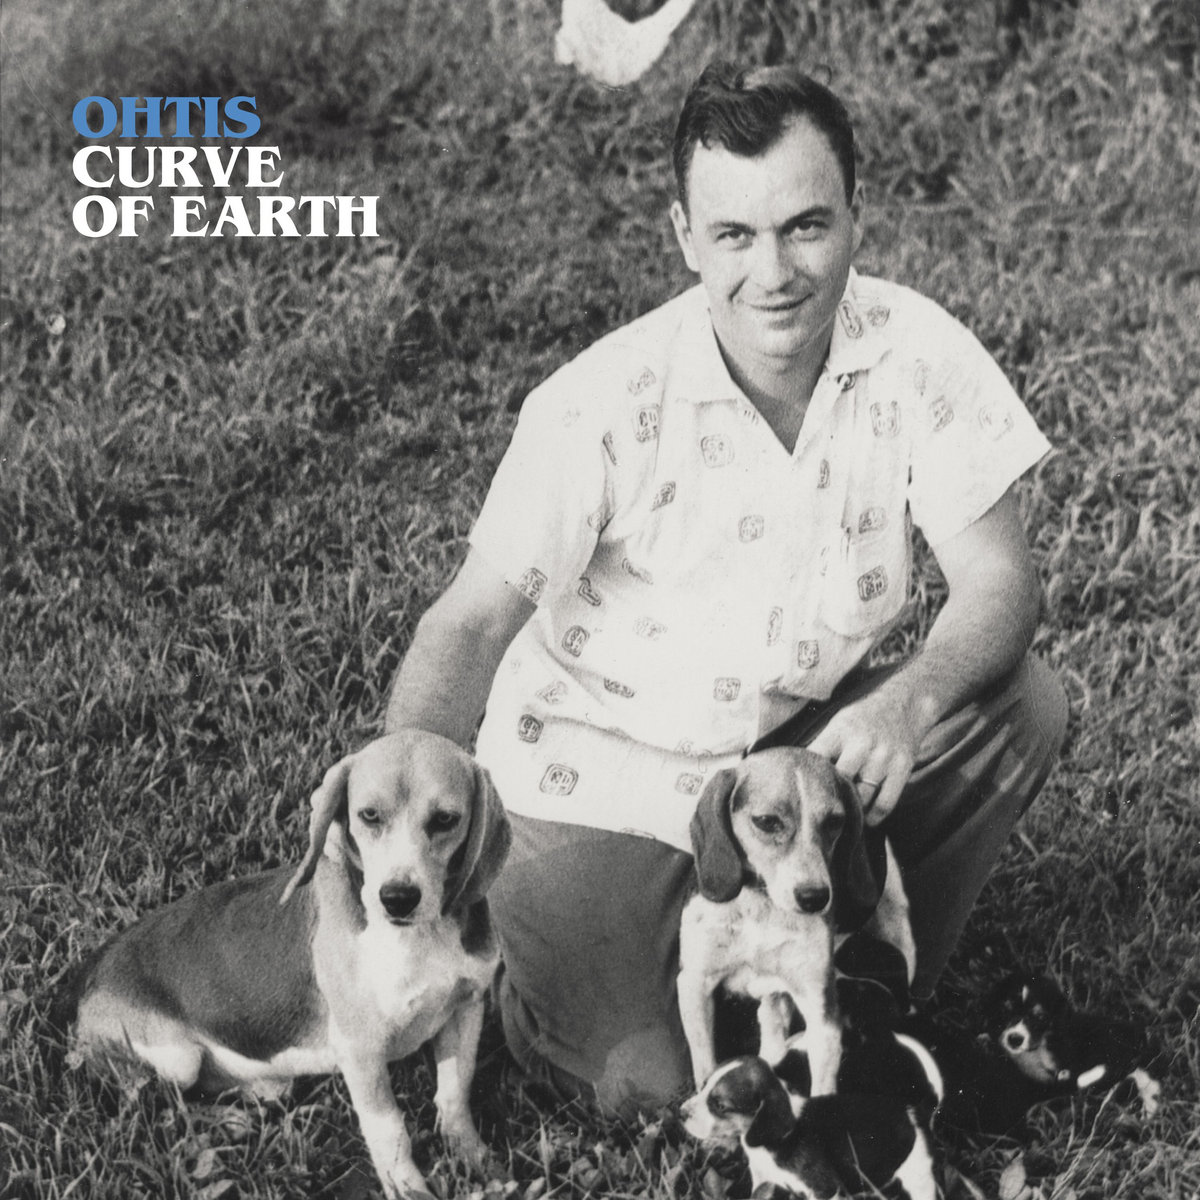 Ohtis Earth